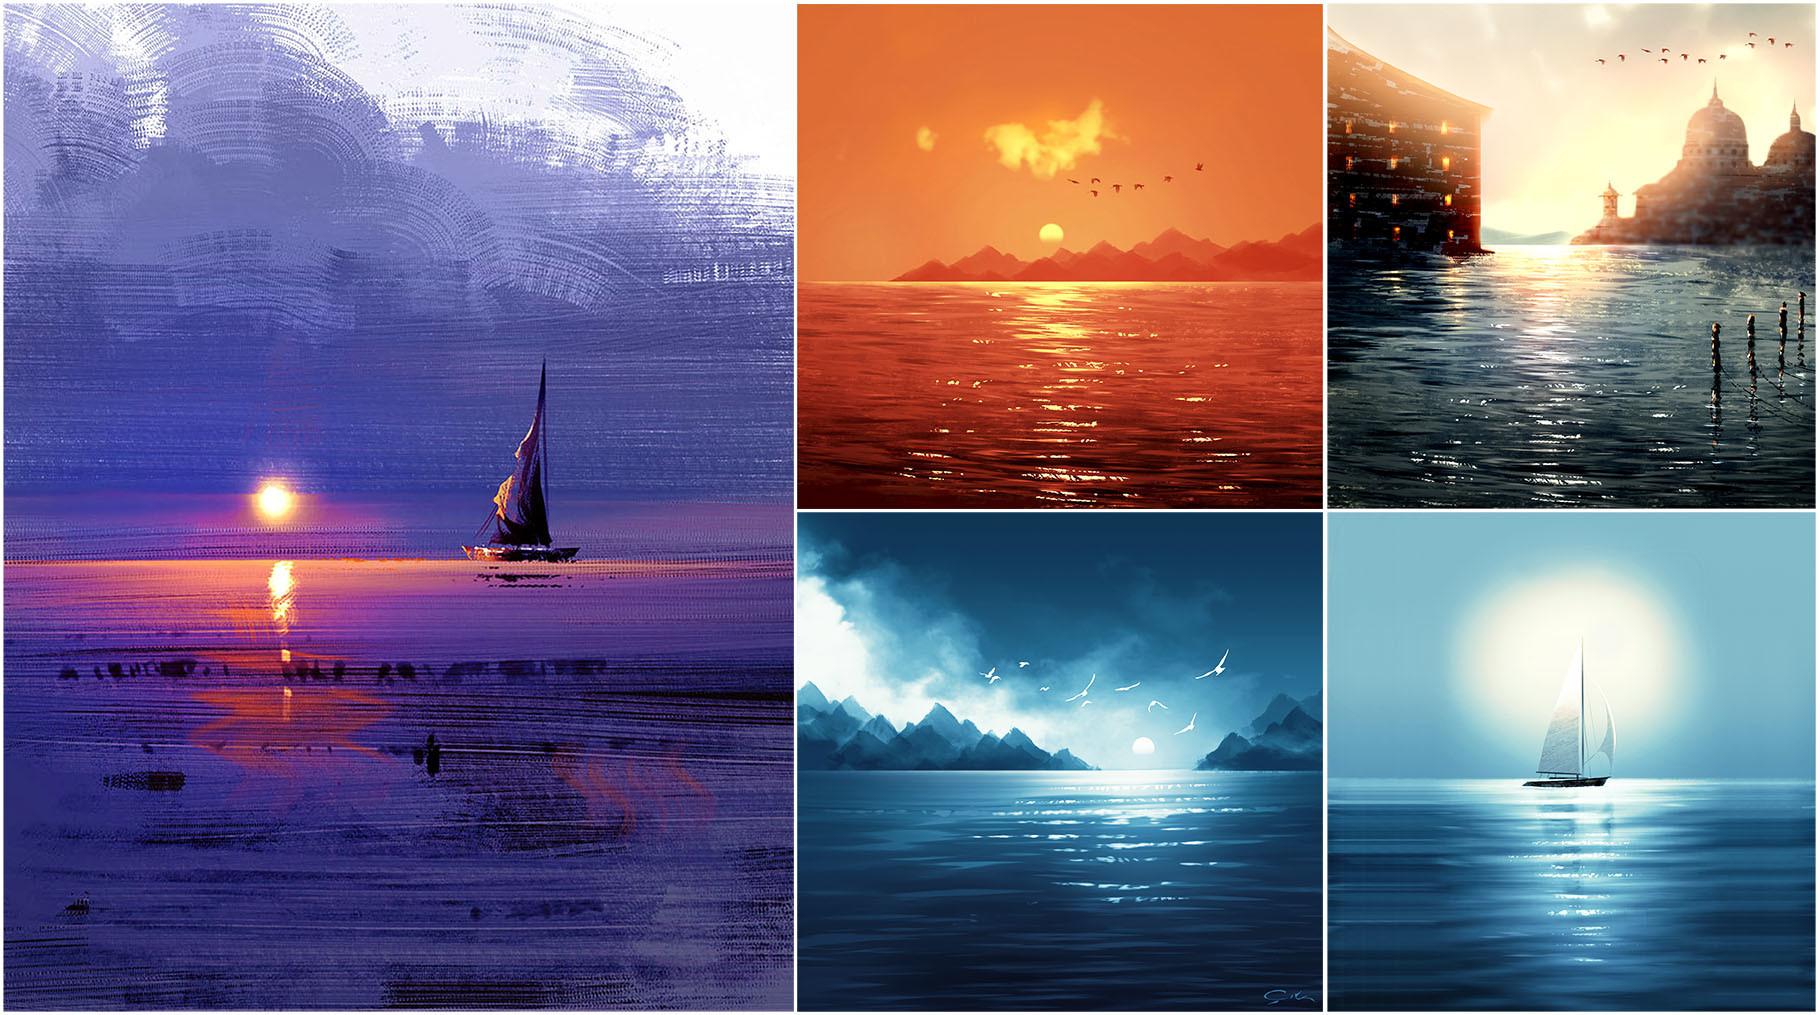 Emrullah cita some works sea